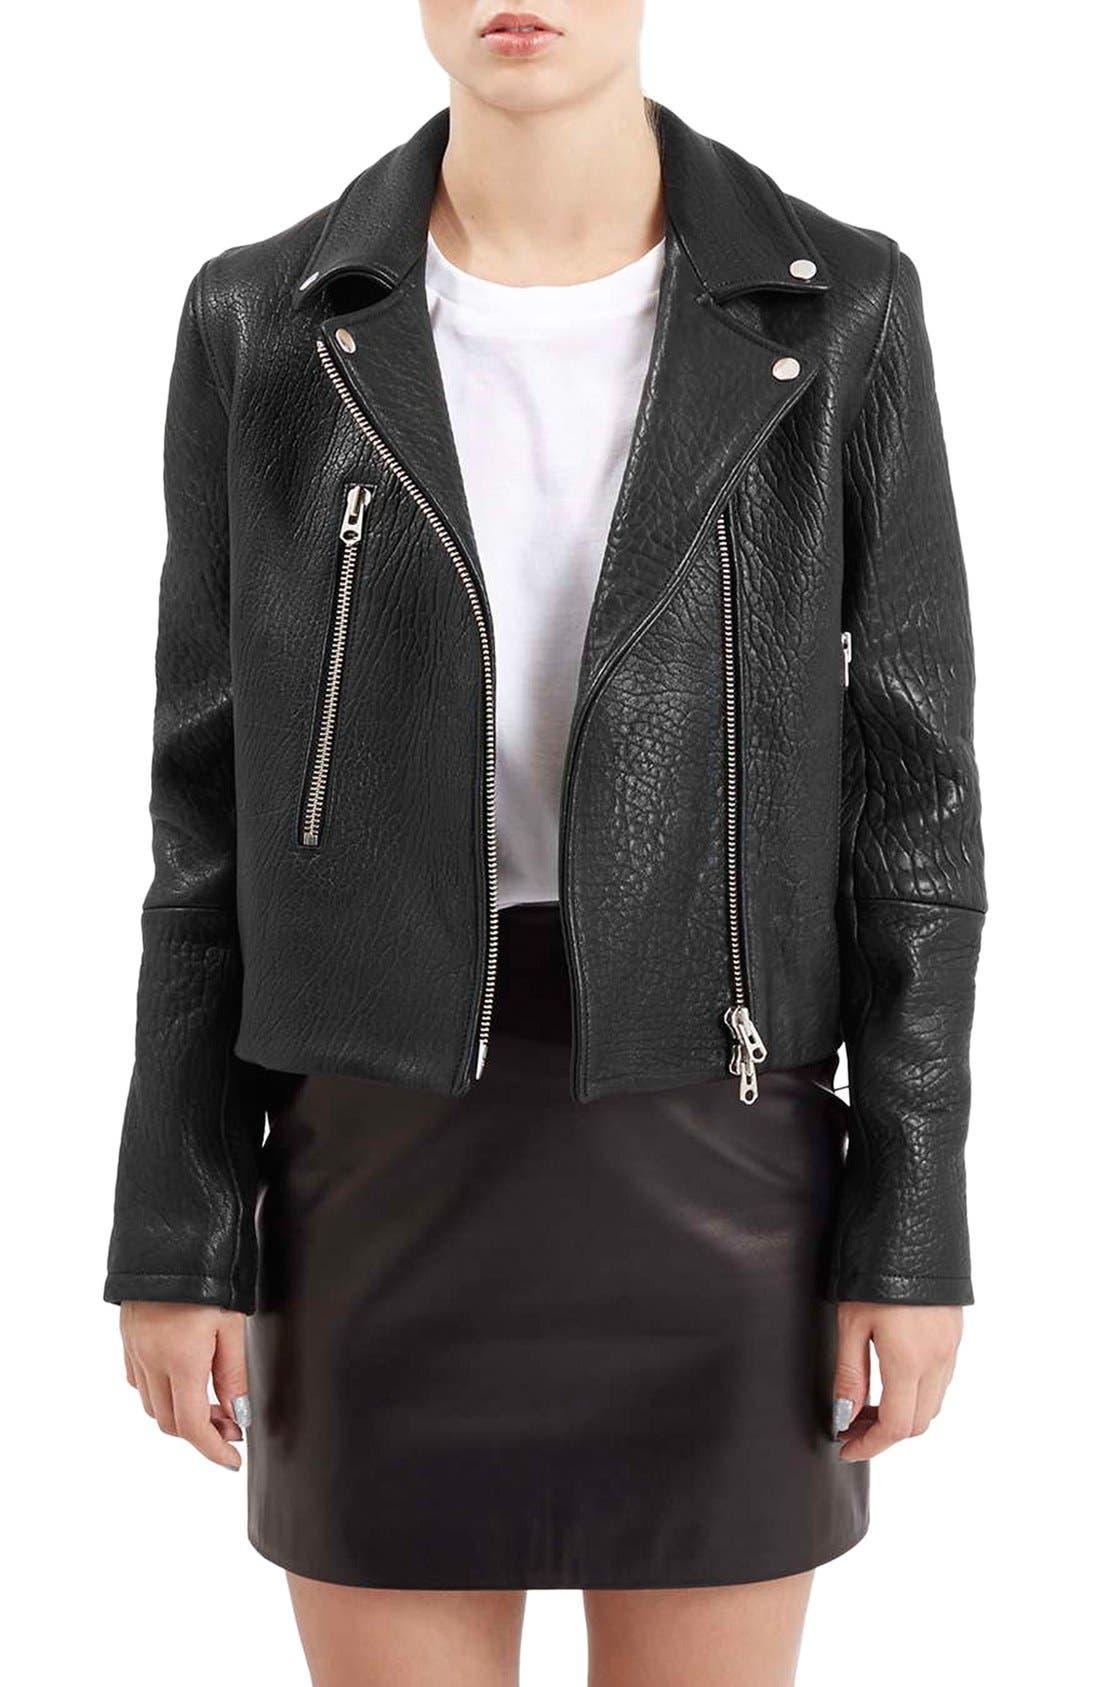 Main Image - Topshop Boutique Leather Biker Jacket